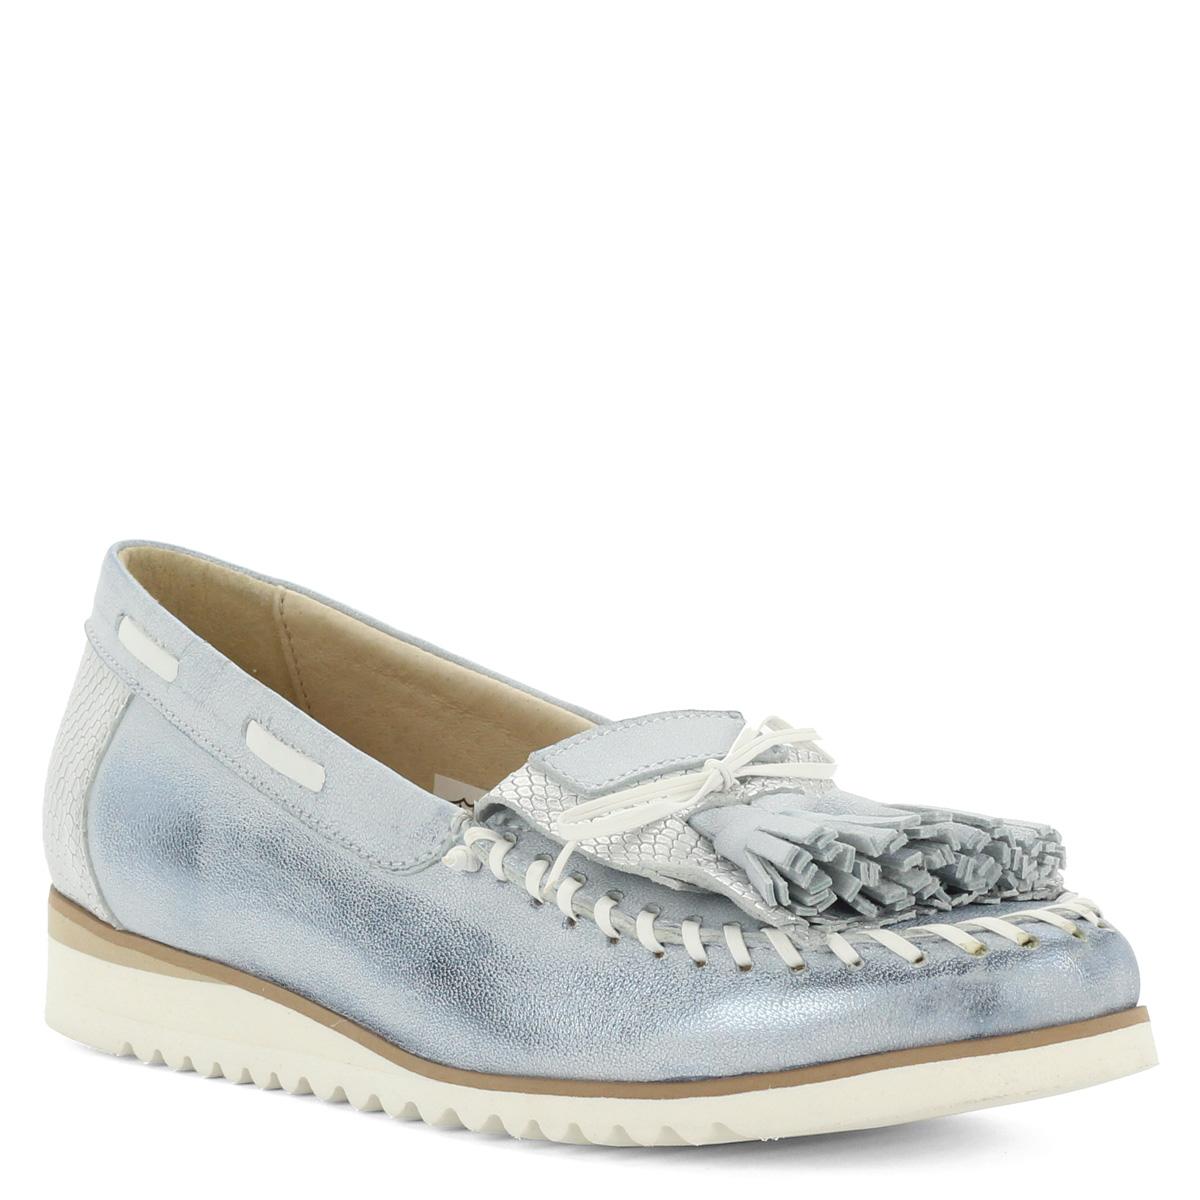 Női cipő Archives - Domini CipőüzletArhívum  76f03ebf43